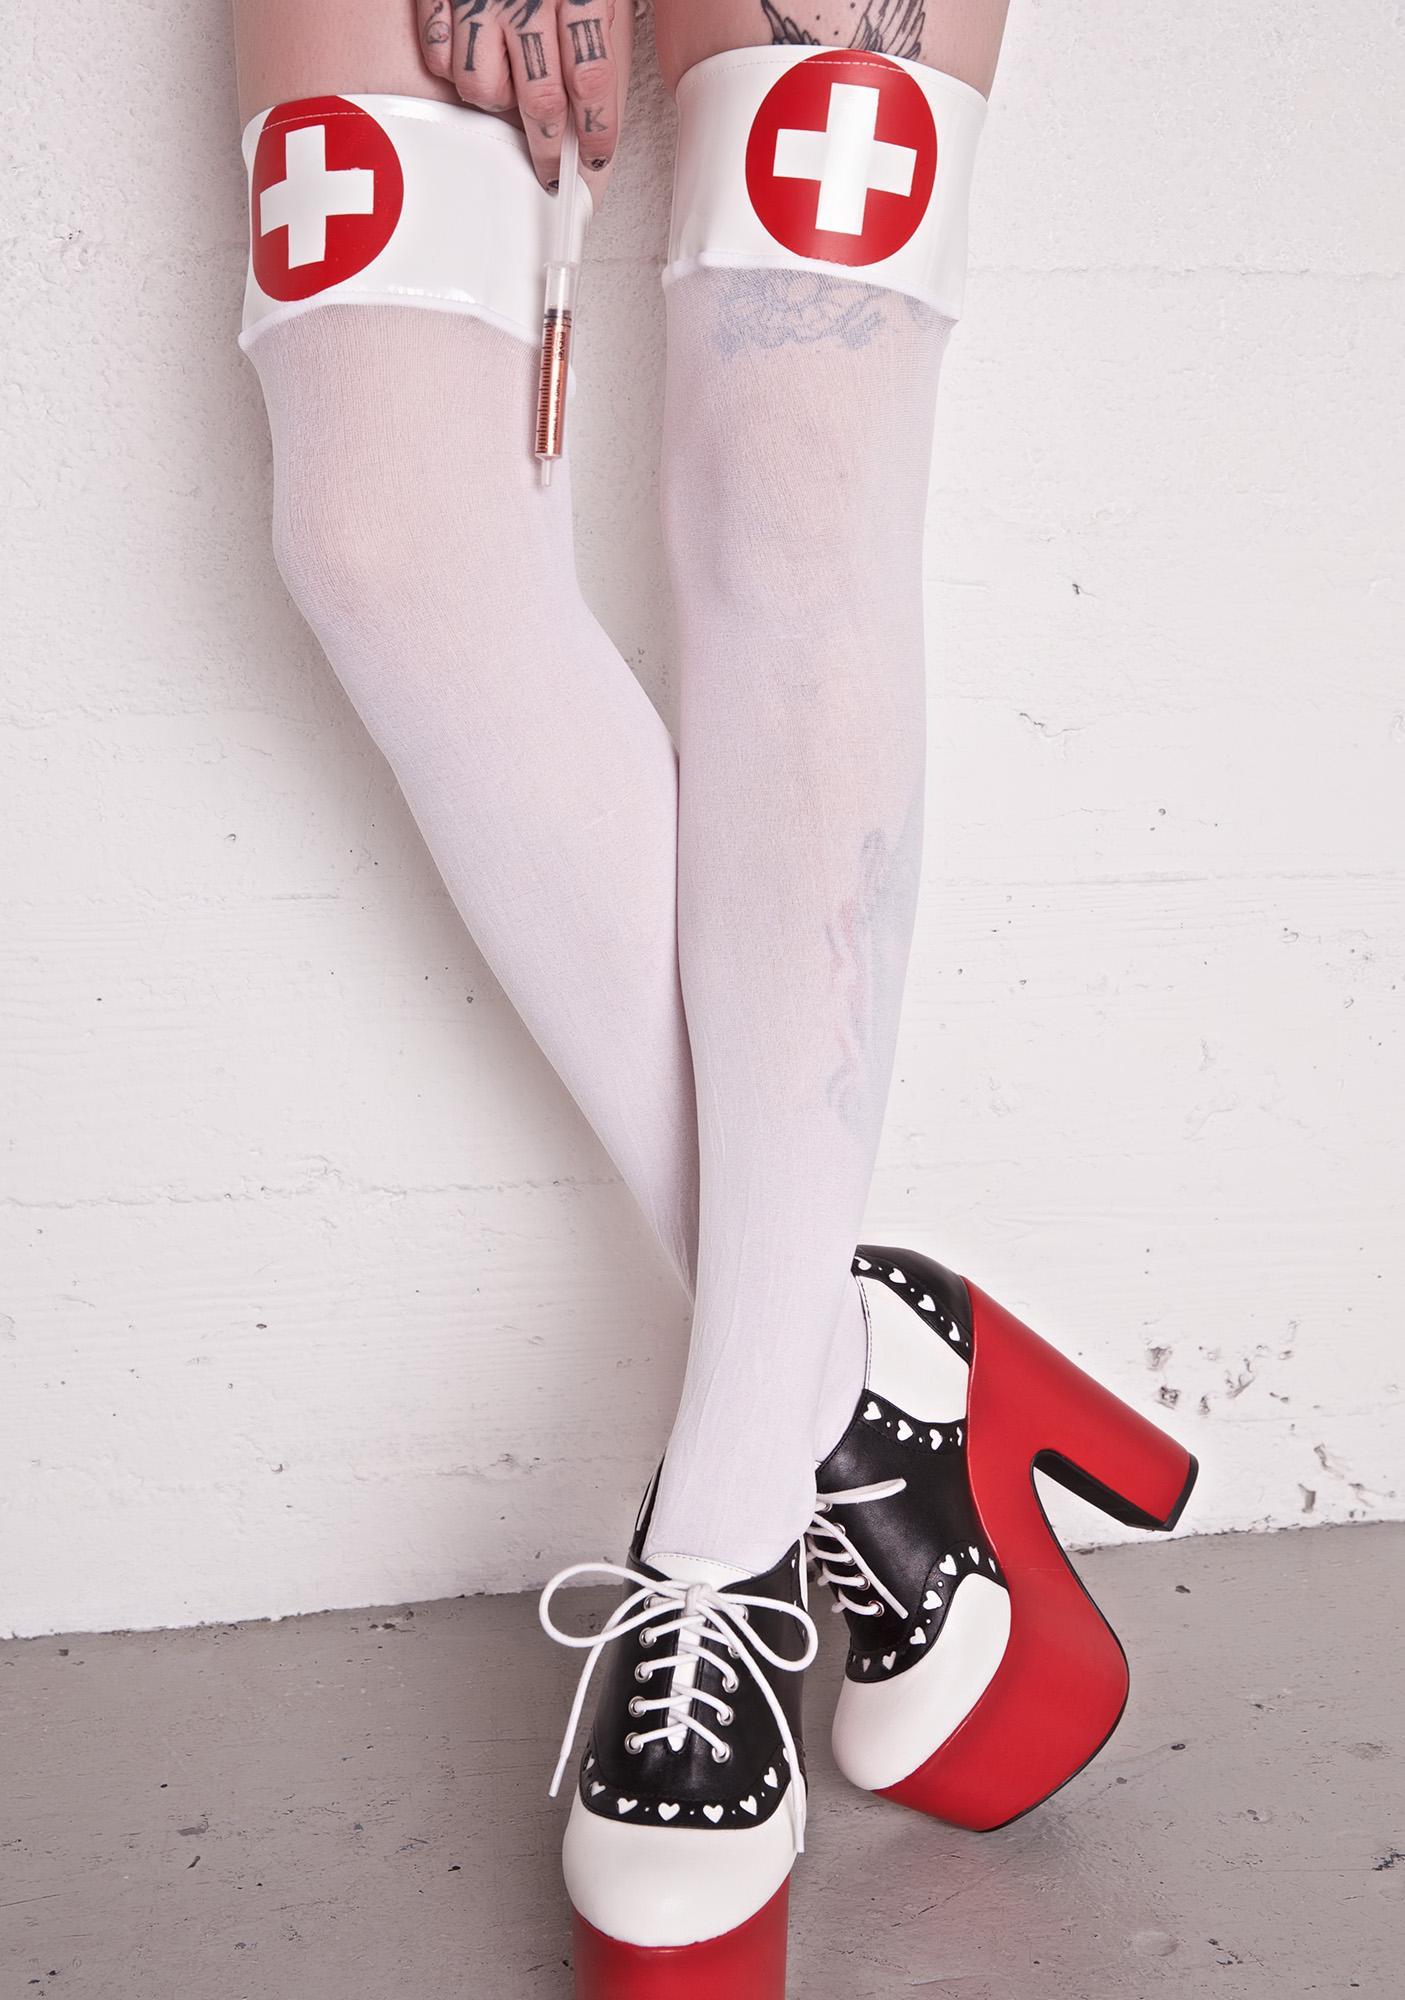 Da Red Cross Thigh High Socks